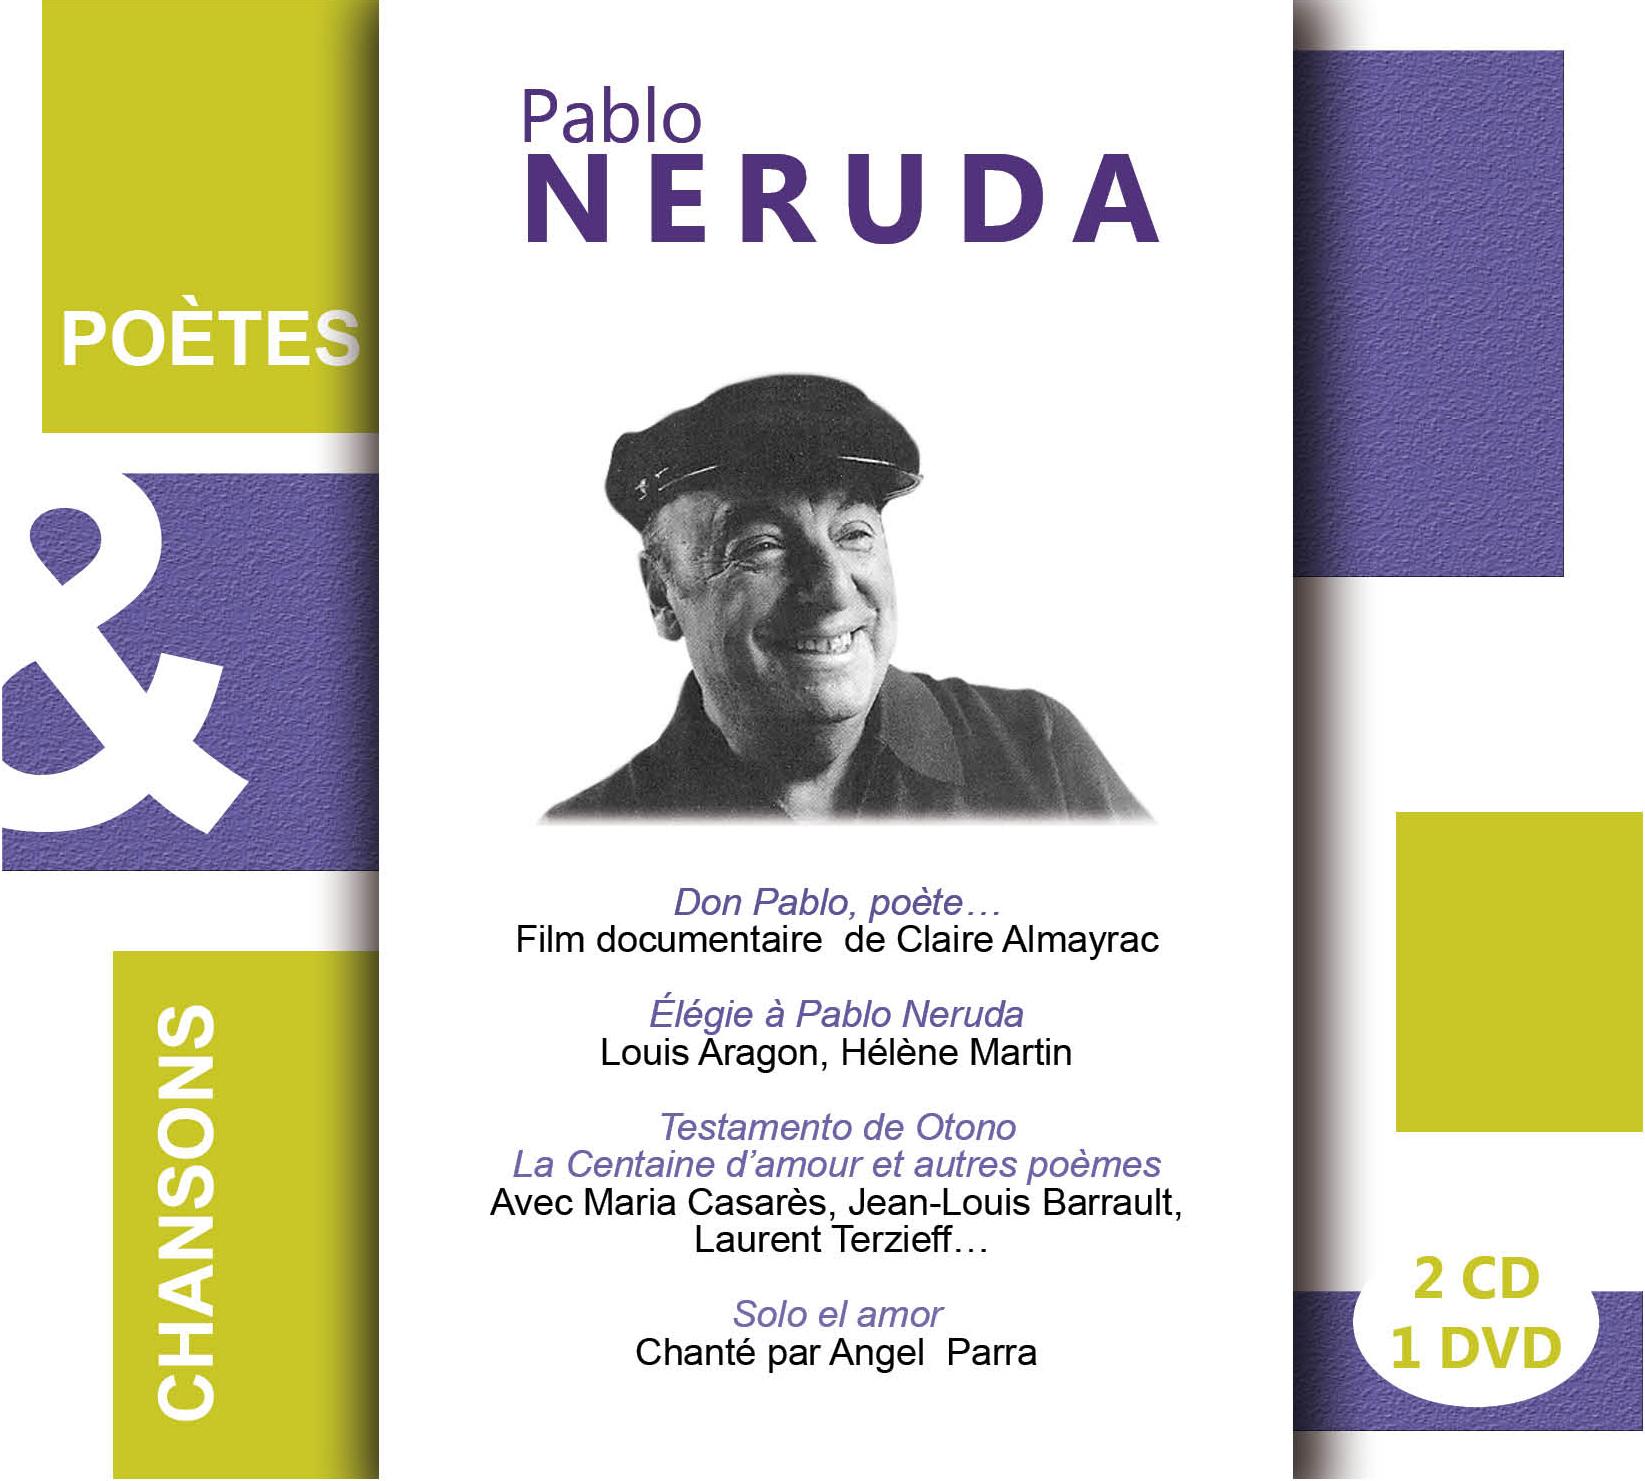 PABLO NERUDA POETES ET CHANSONS